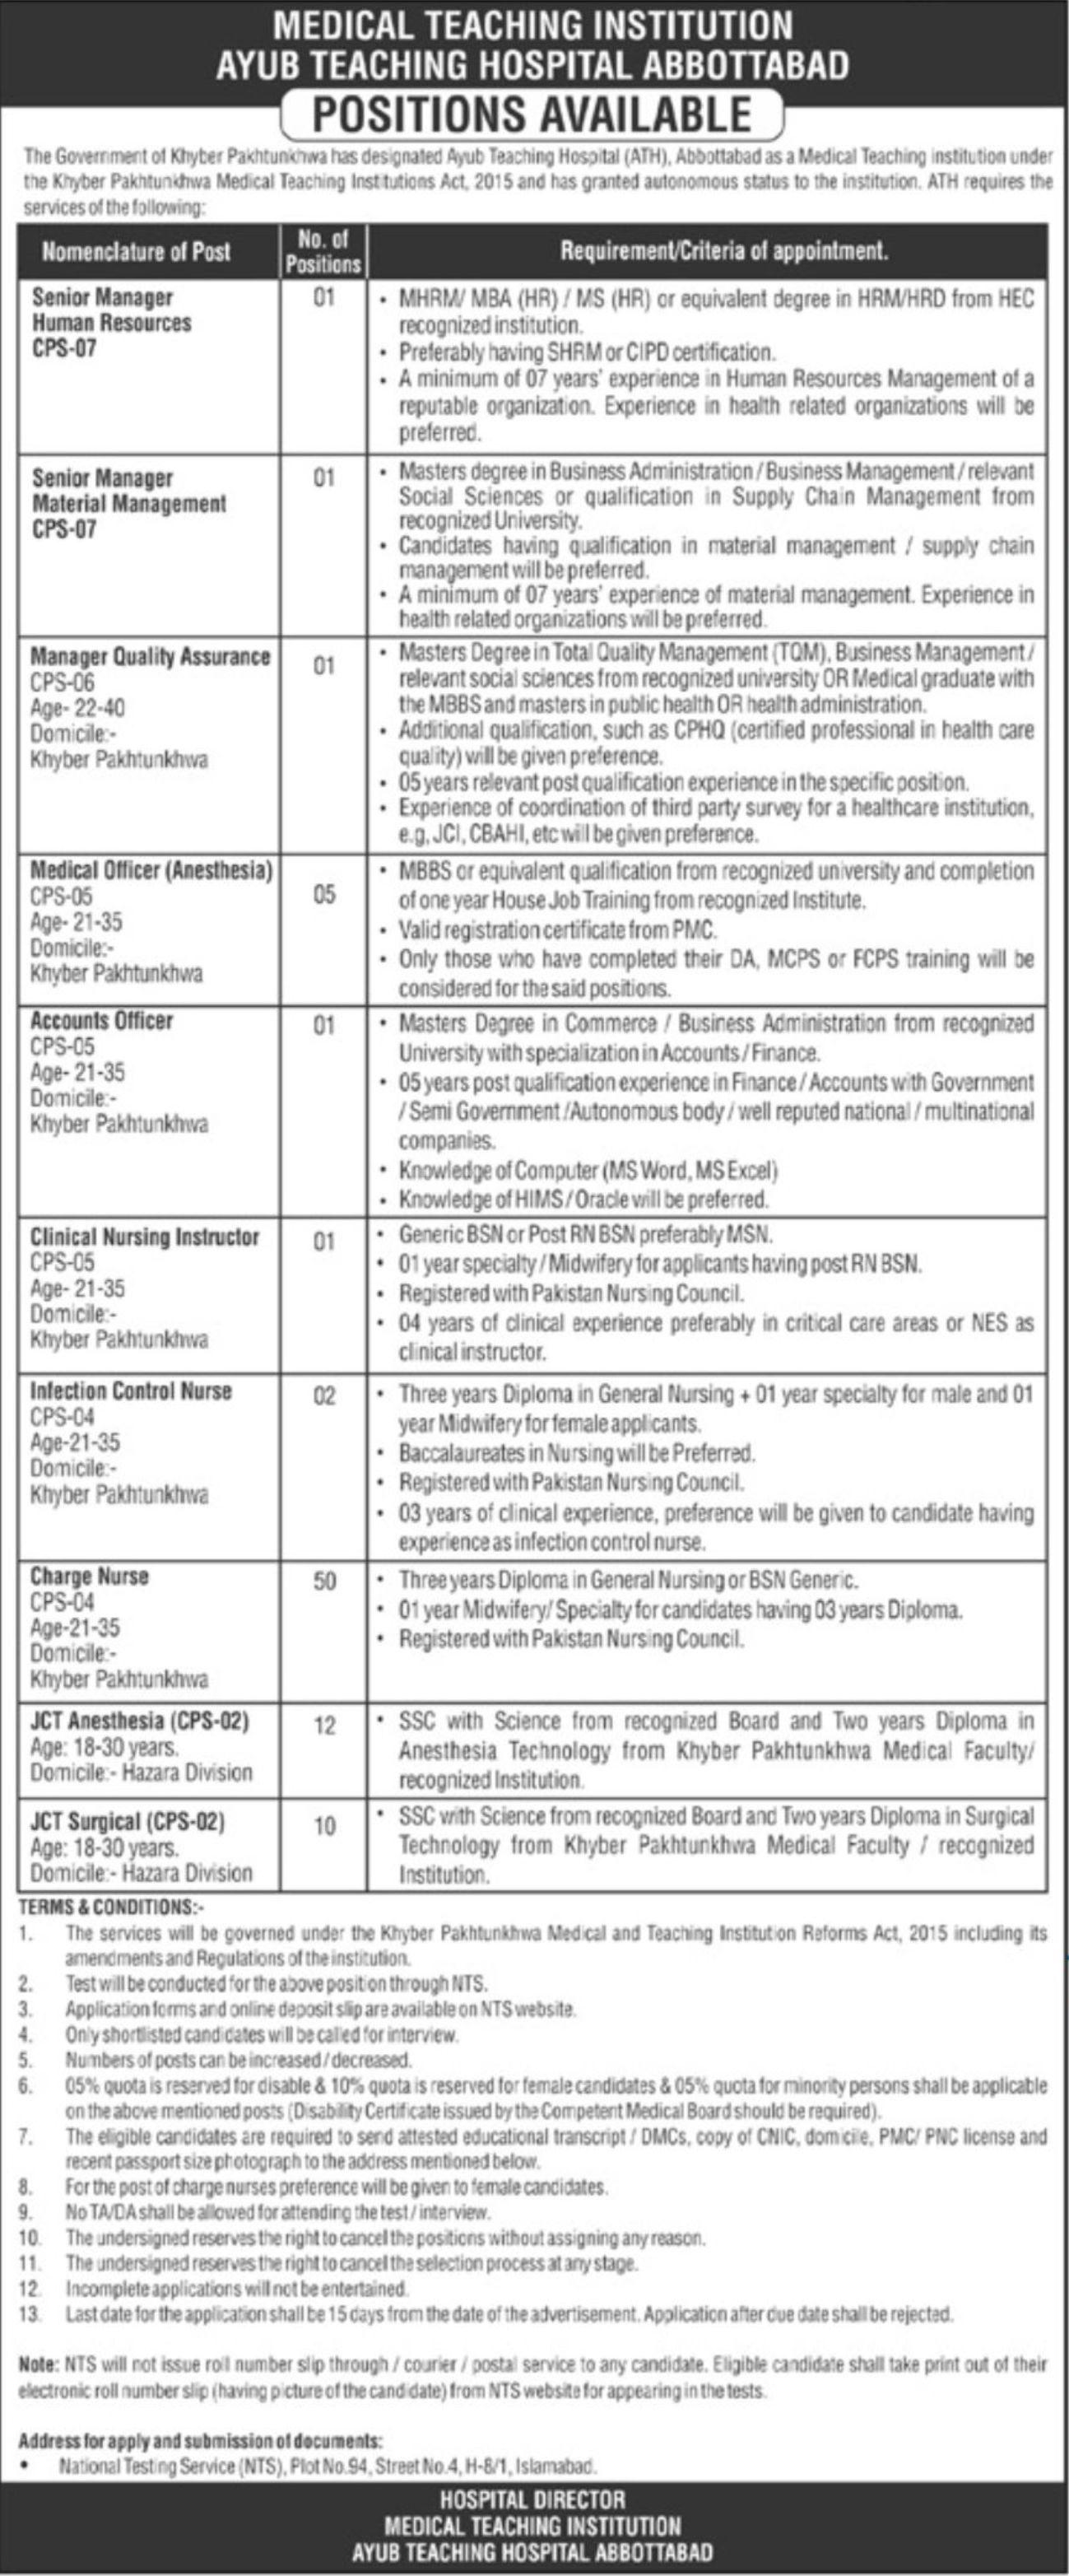 Medical Teaching Institution Ayub Teaching Hospital Abbottabad Vacancies 2021 – Latest Jobs 3